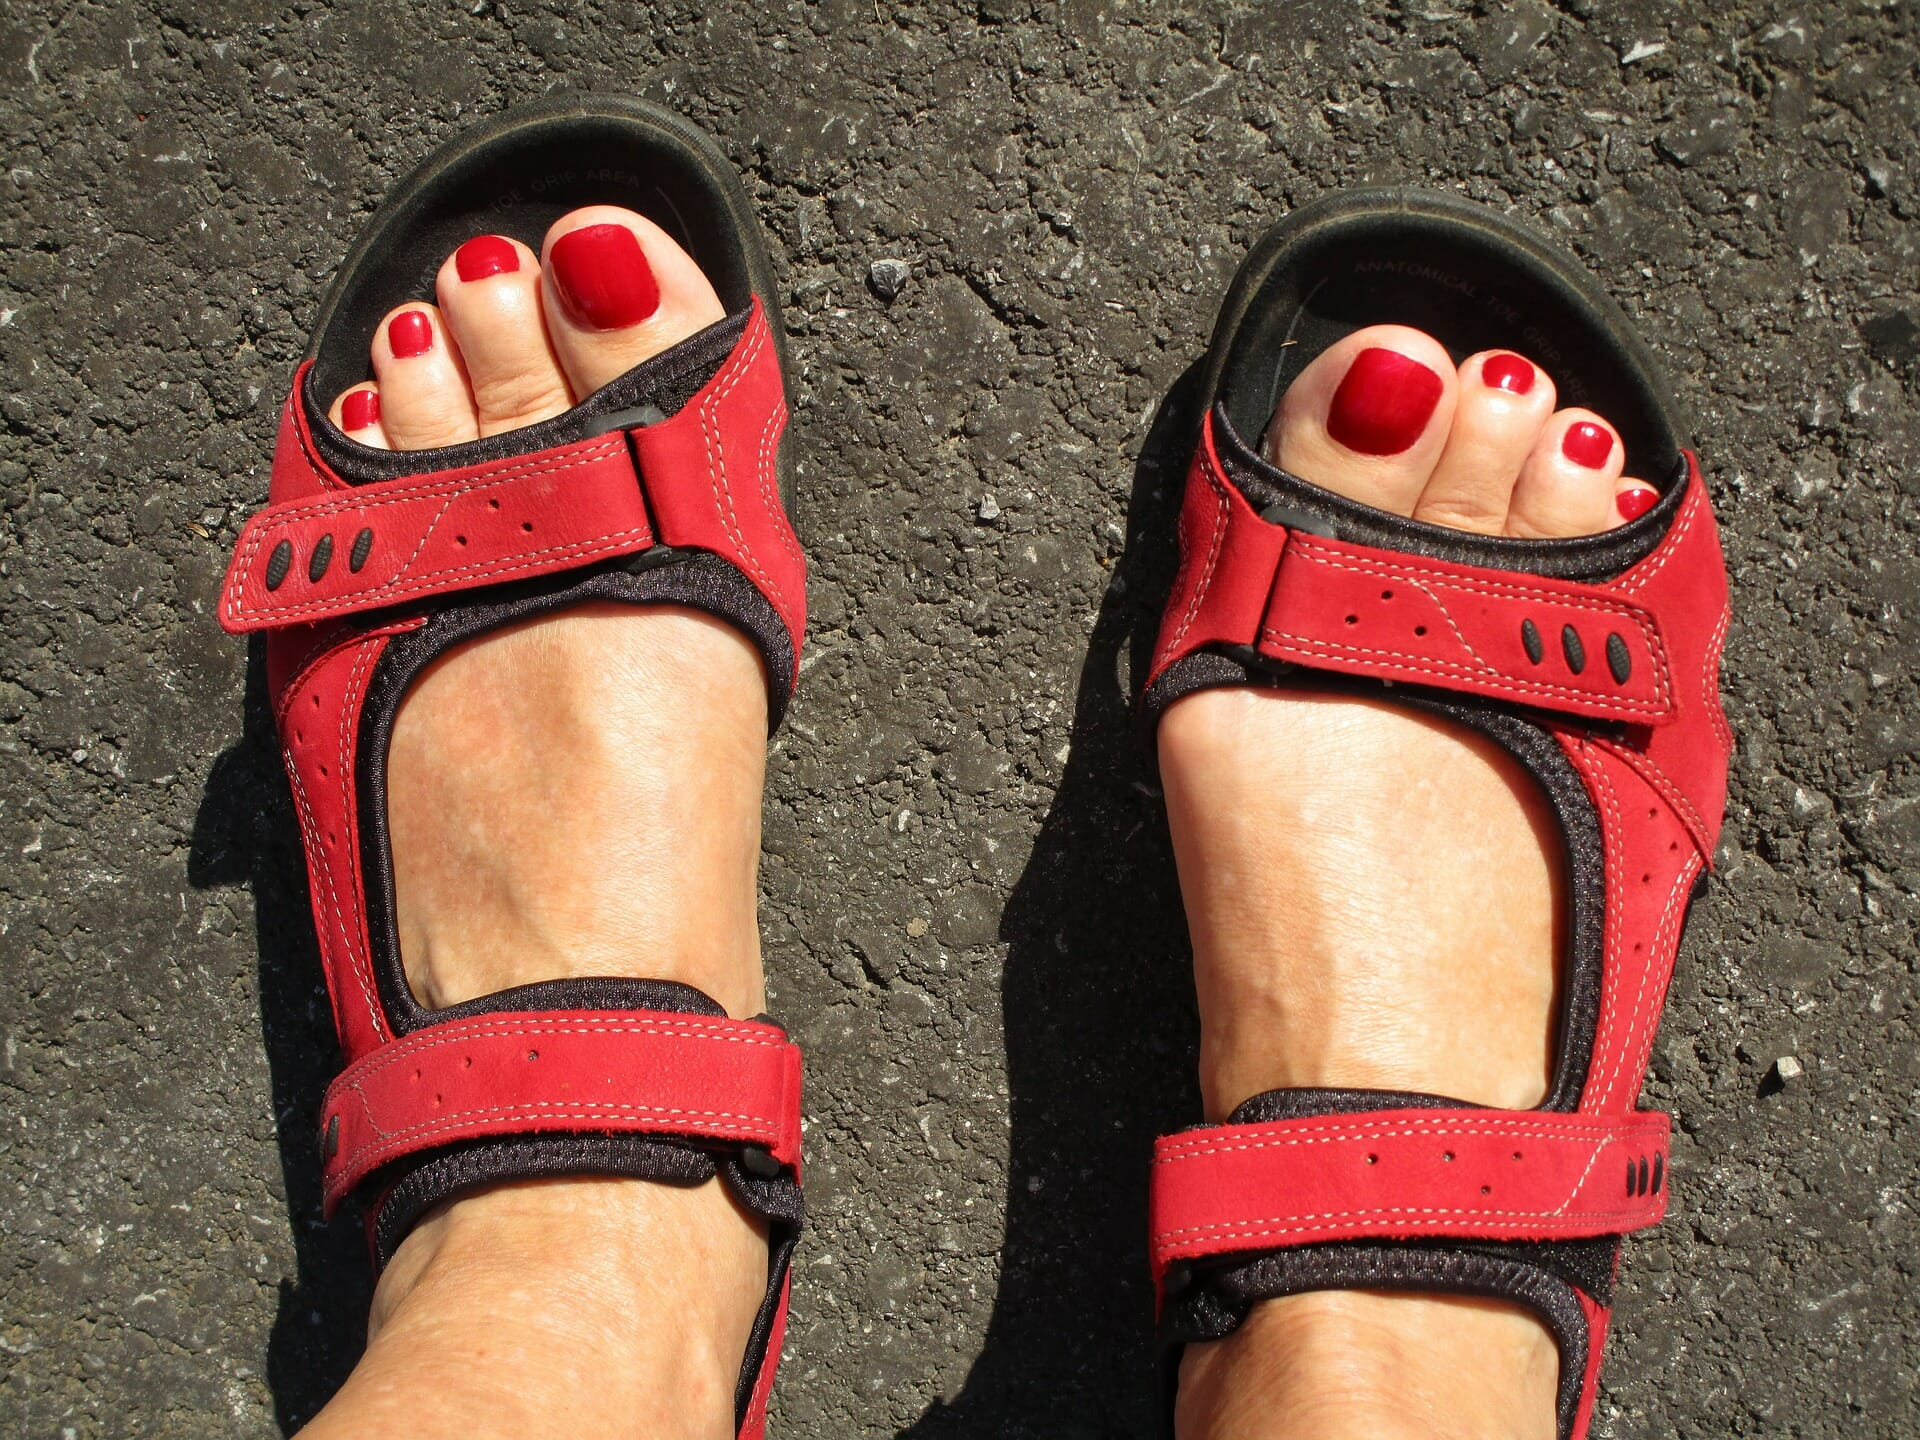 feet 2551966 1920